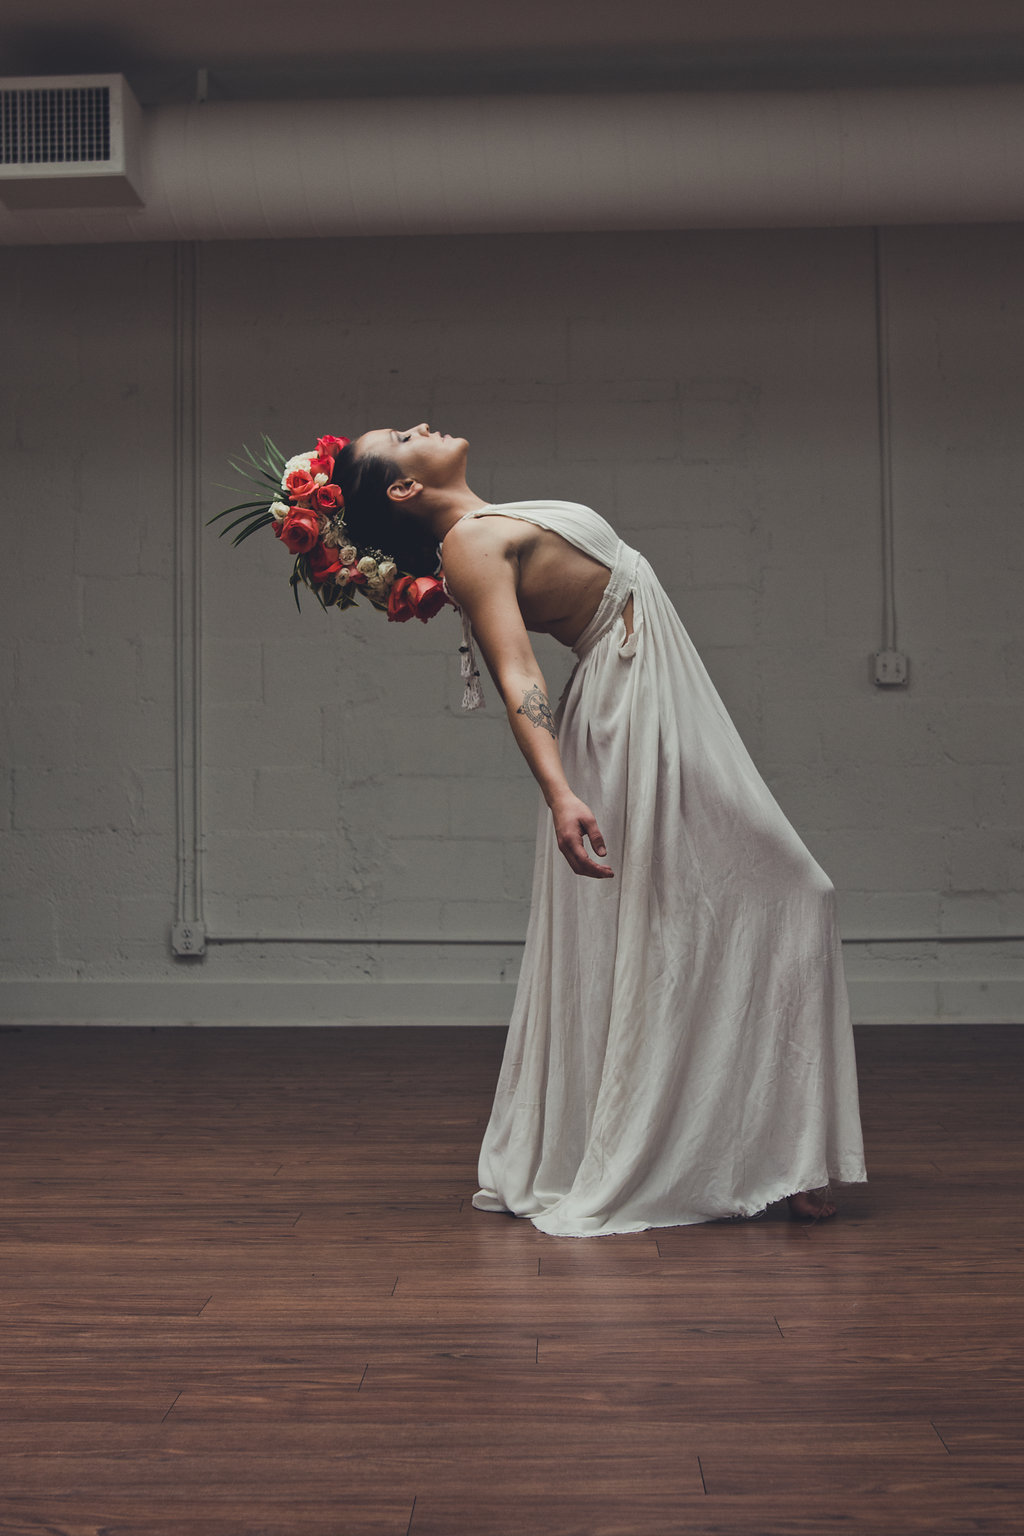 Lisa Rundall Wedding Photography Colorado model leaning backward